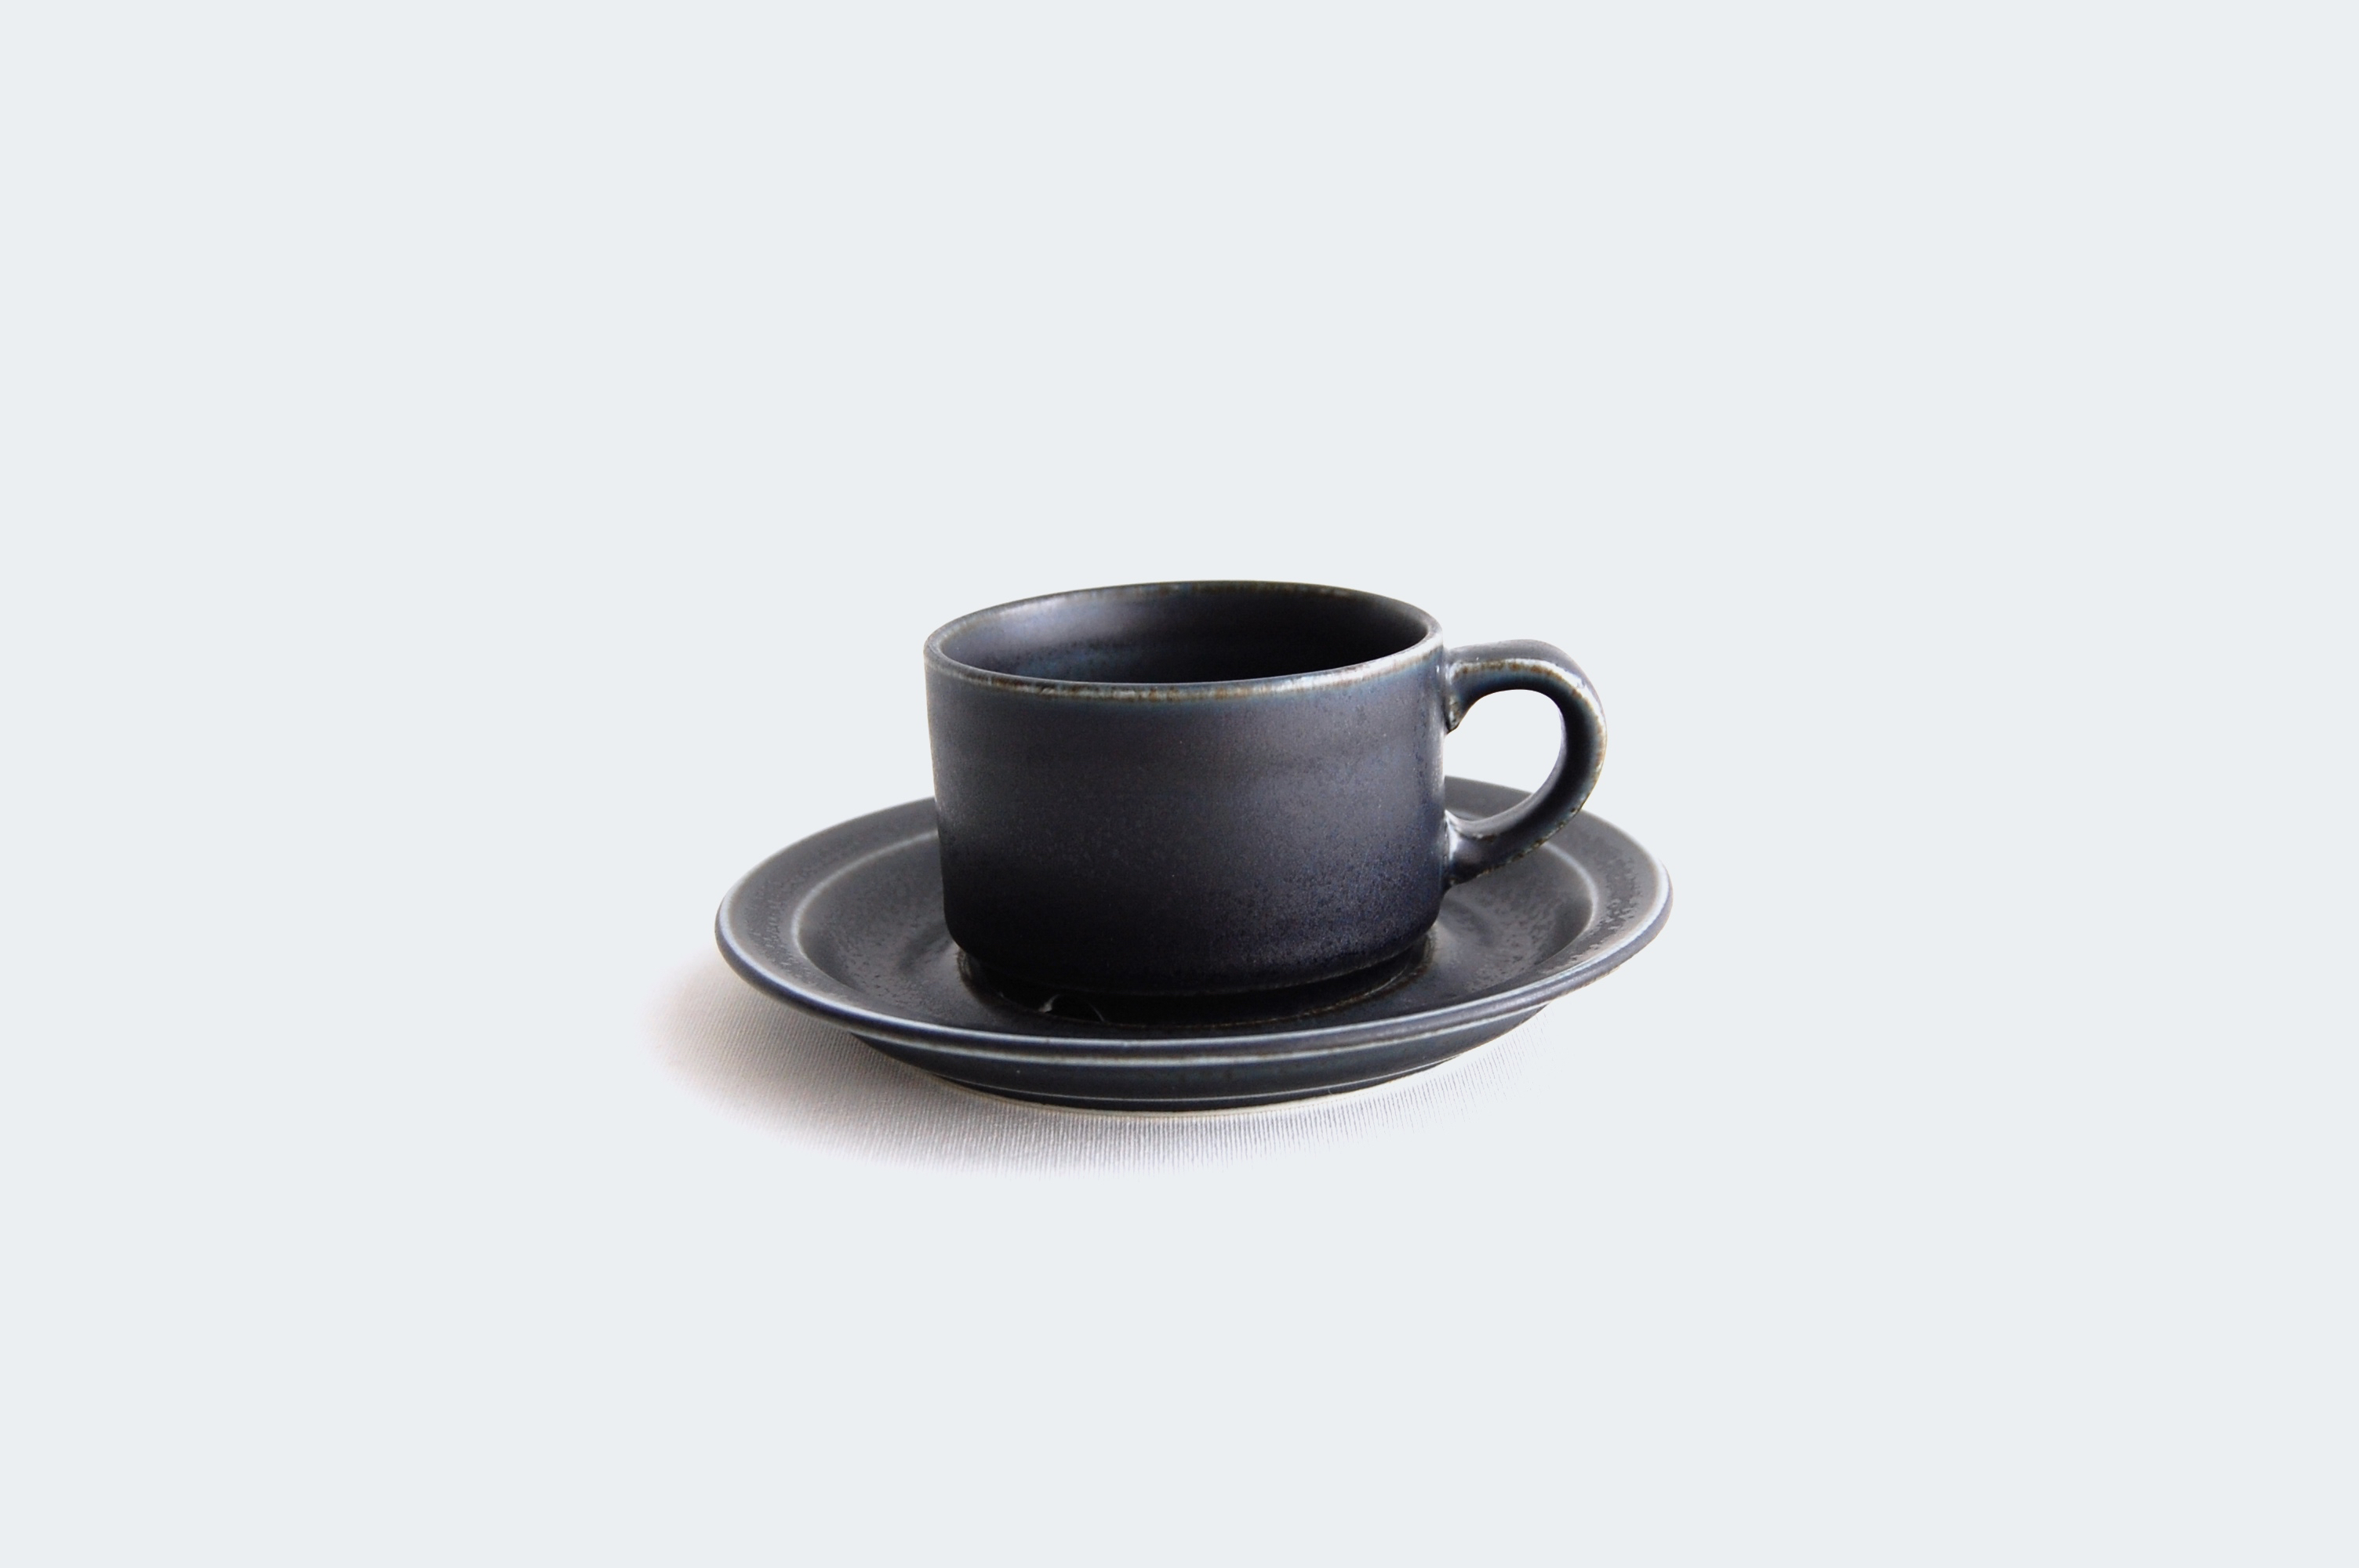 ARABIA/アラビア Korpi/コルピ コーヒーカップ&ソーサー 01